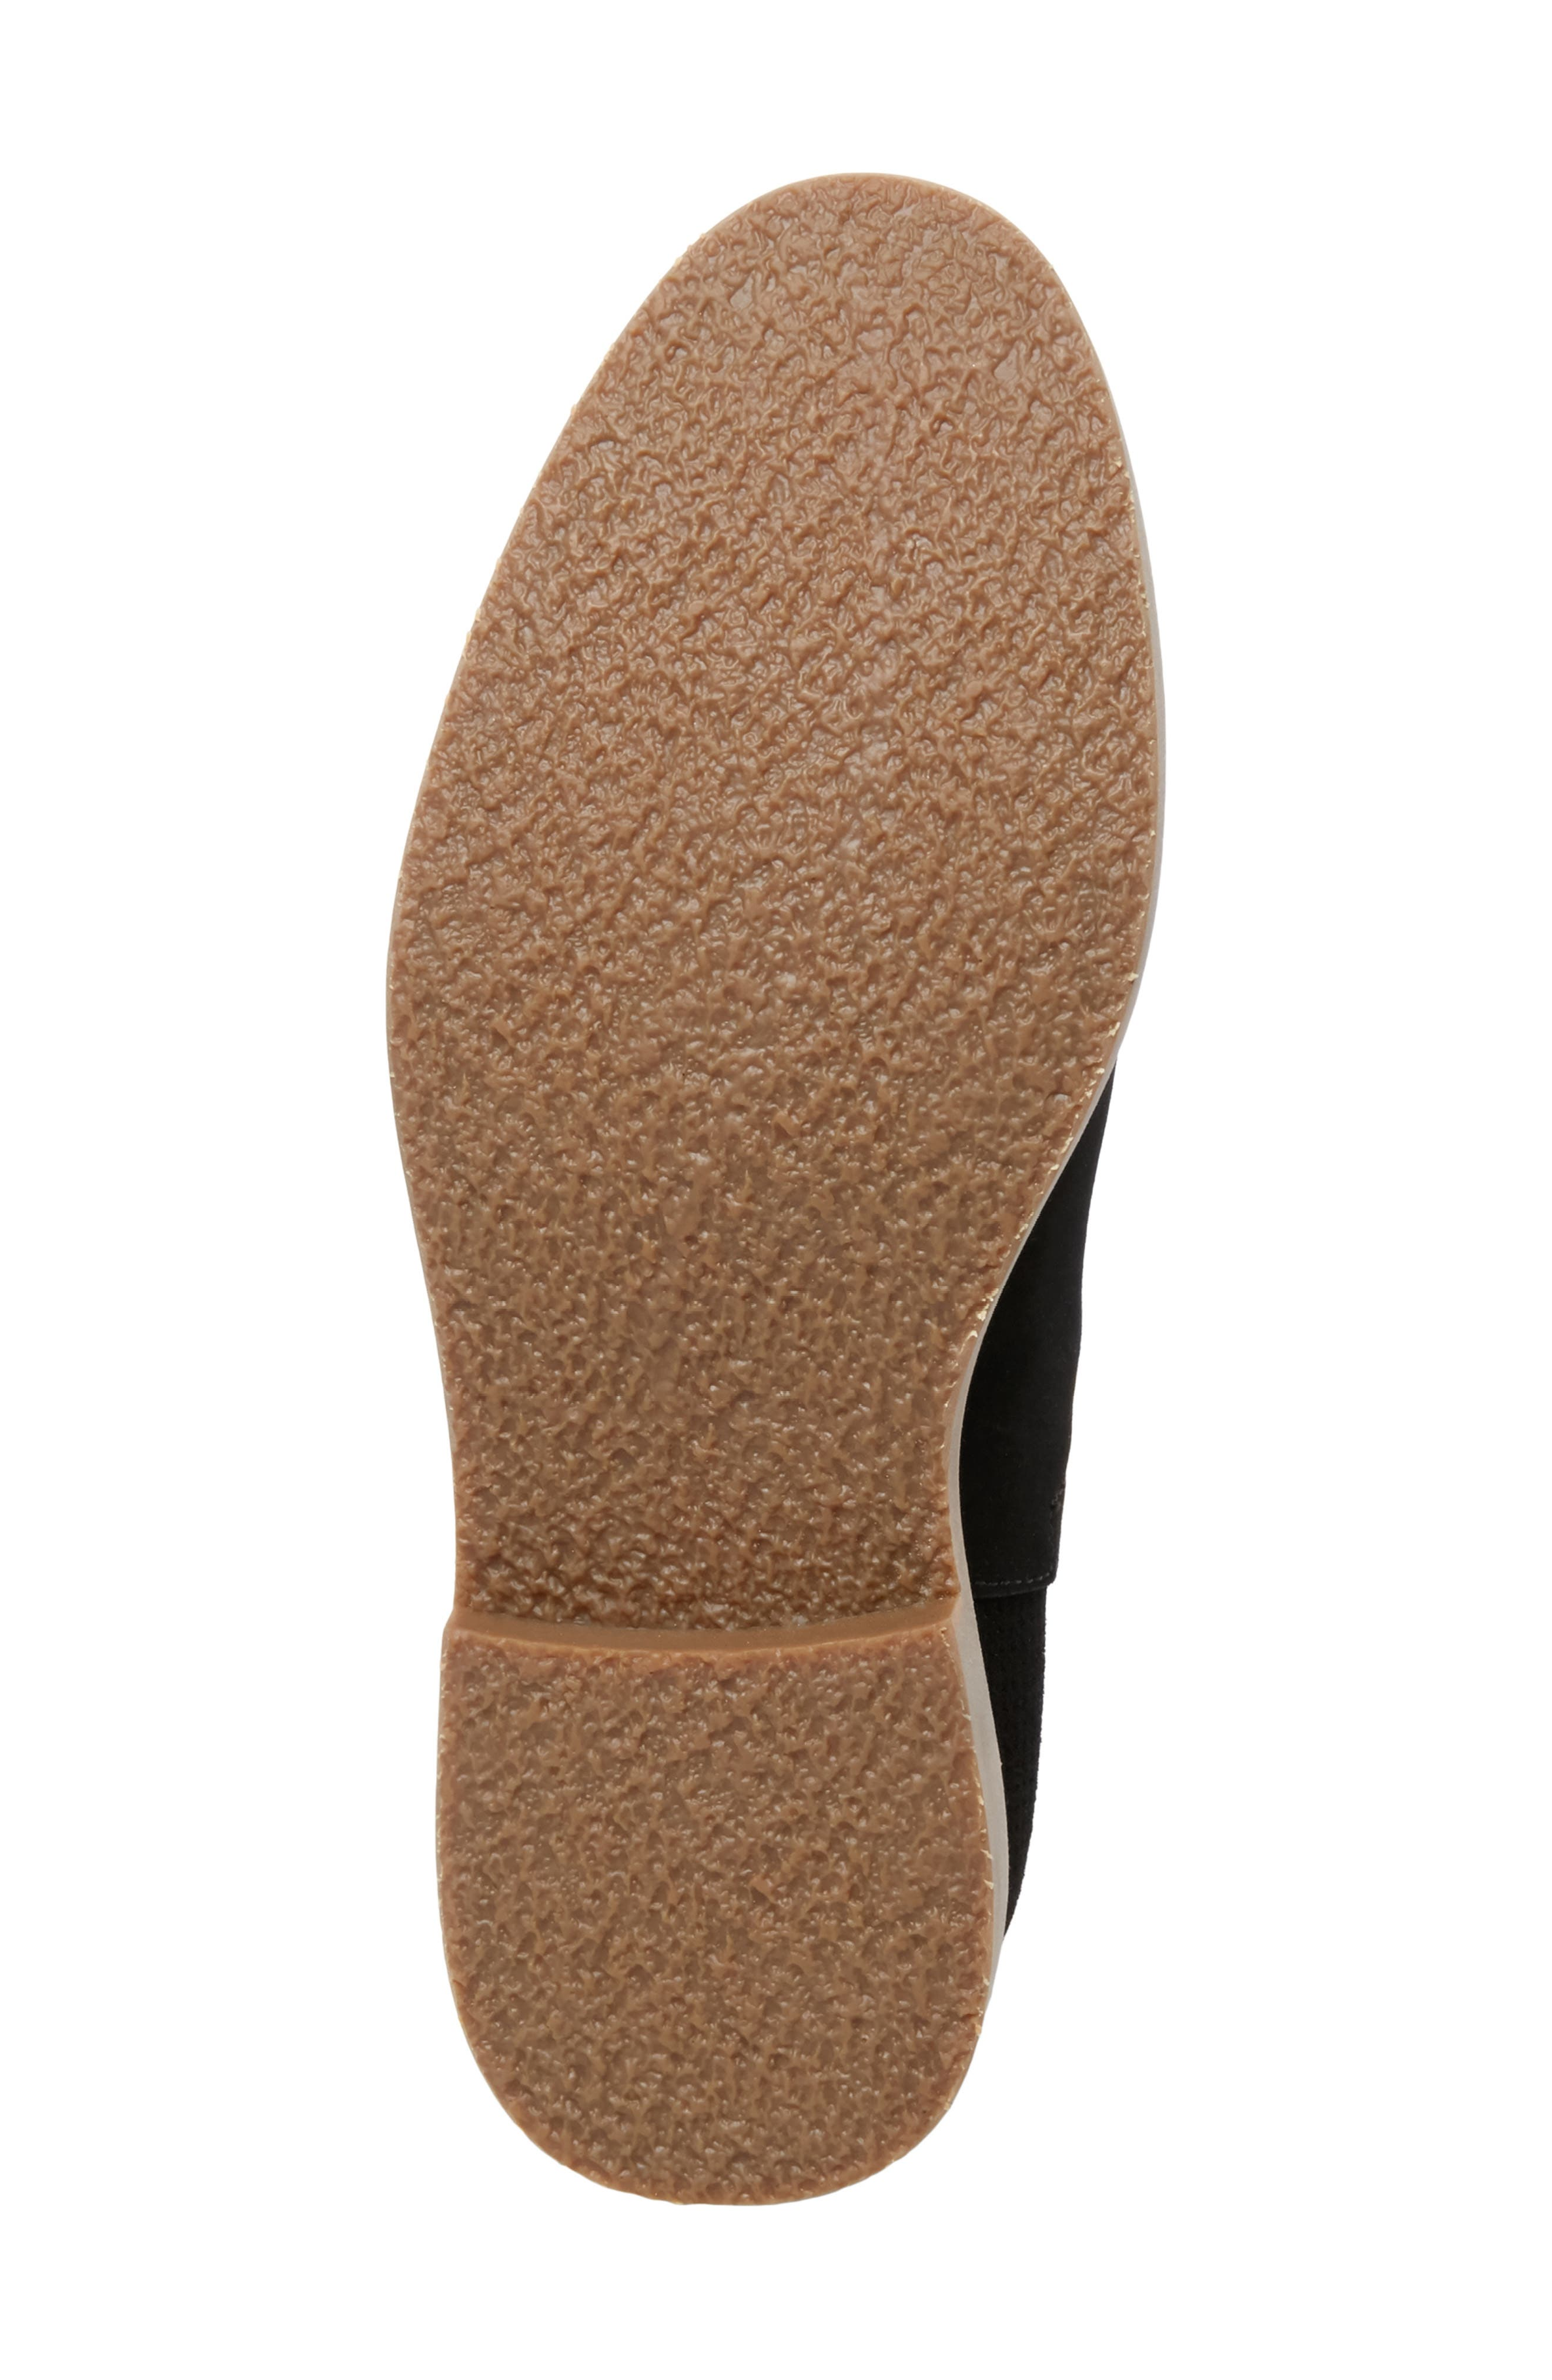 Highlyte Textured Chelsea Boot,                             Alternate thumbnail 6, color,                             006